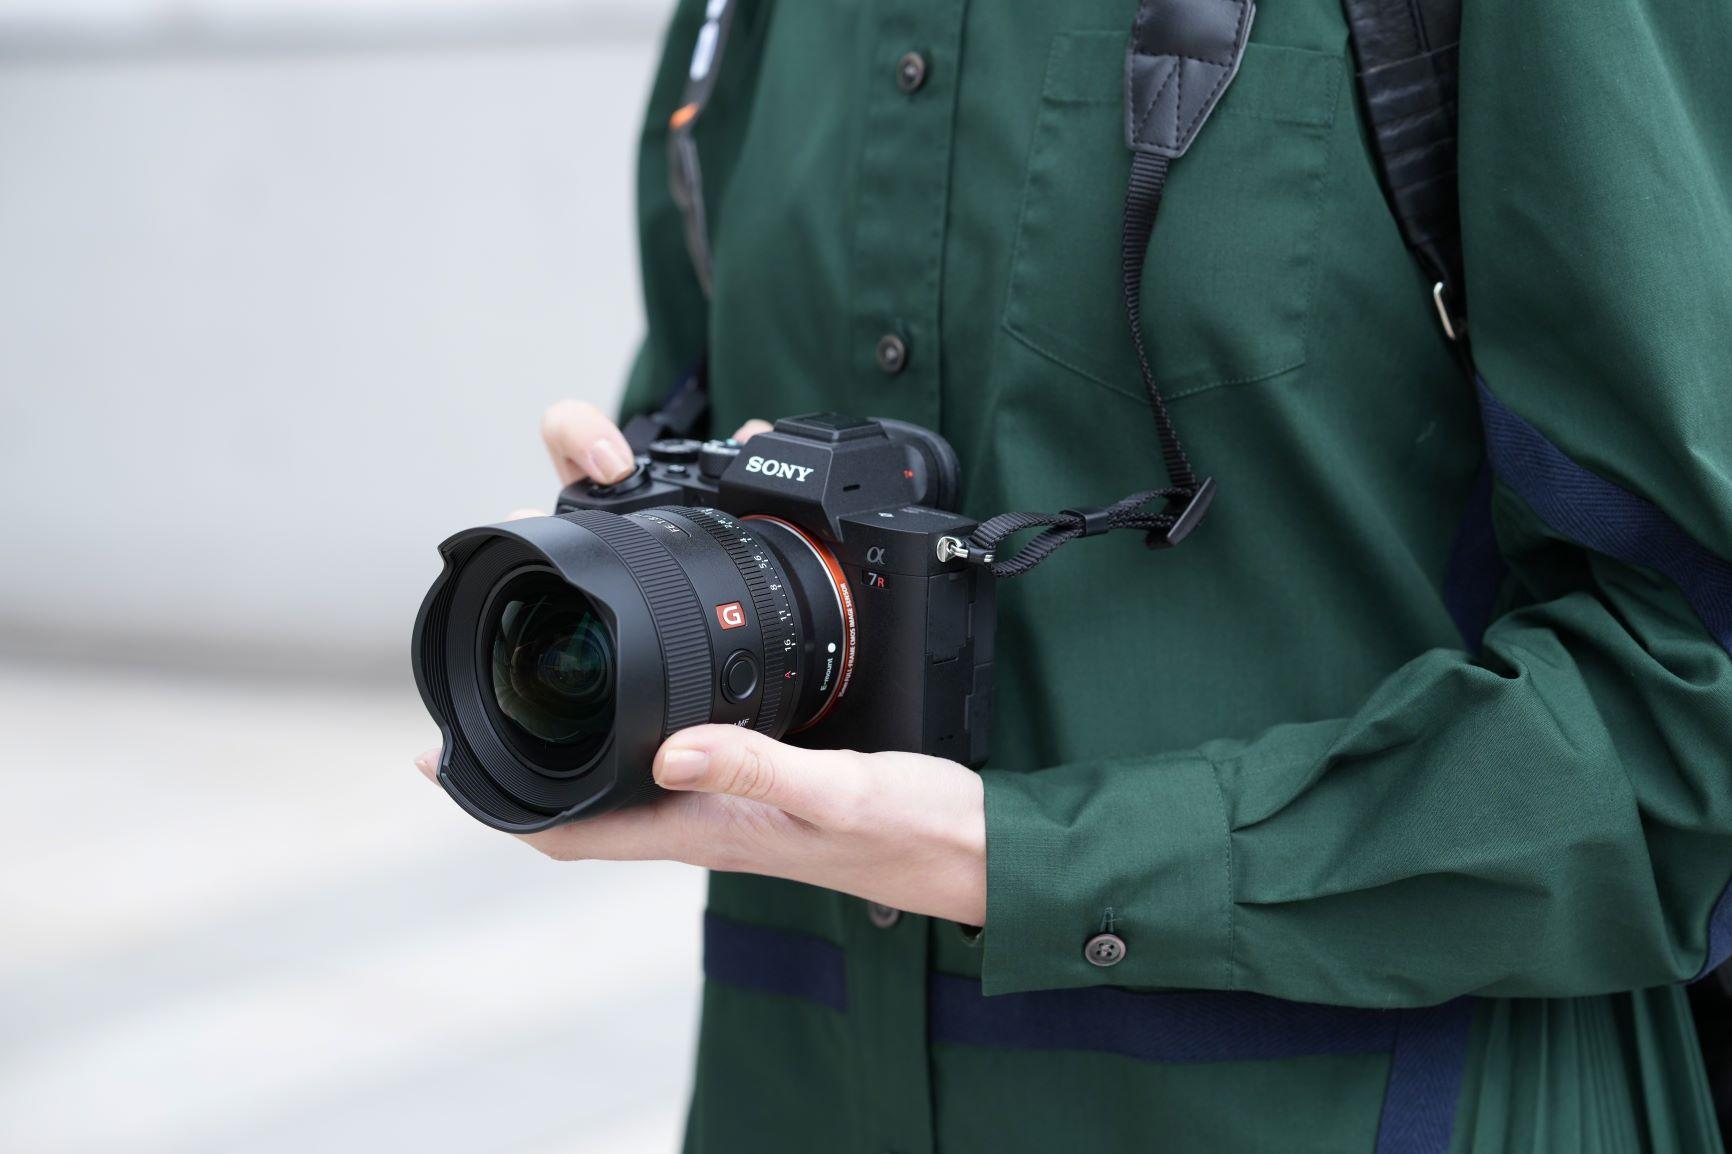 Das FSony E 14 Millimeter F1.8 GM (Modell SEL-14F18GM). ist ein kompaktes Ultraweitwinkelobjektiv für Sonys Vollformatkameras. (c) Sony